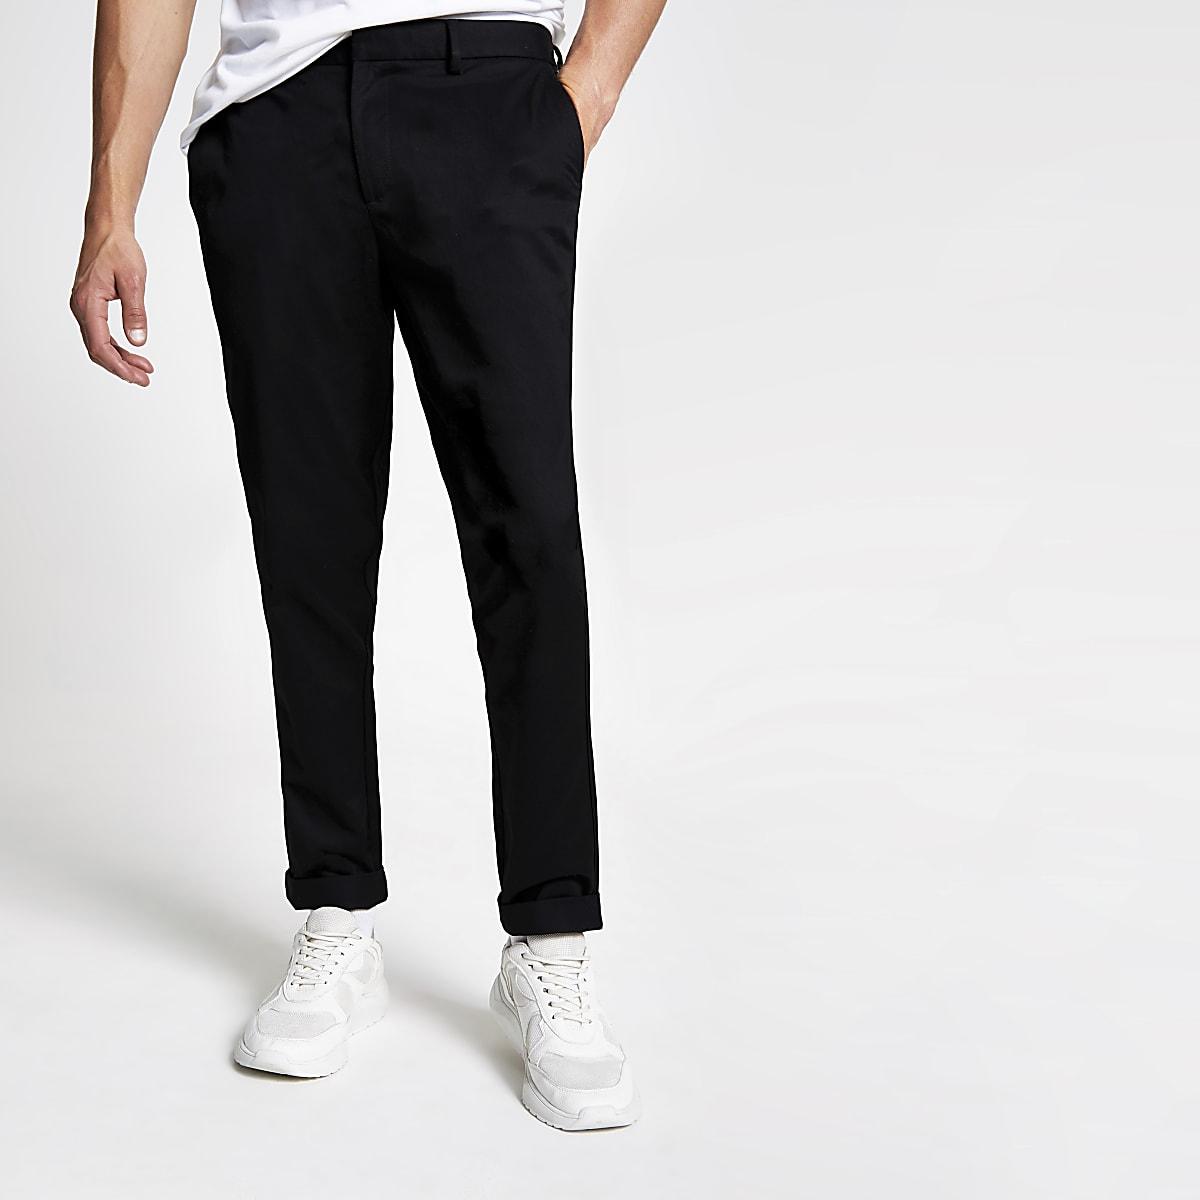 Pantalon chino noir coupe slim